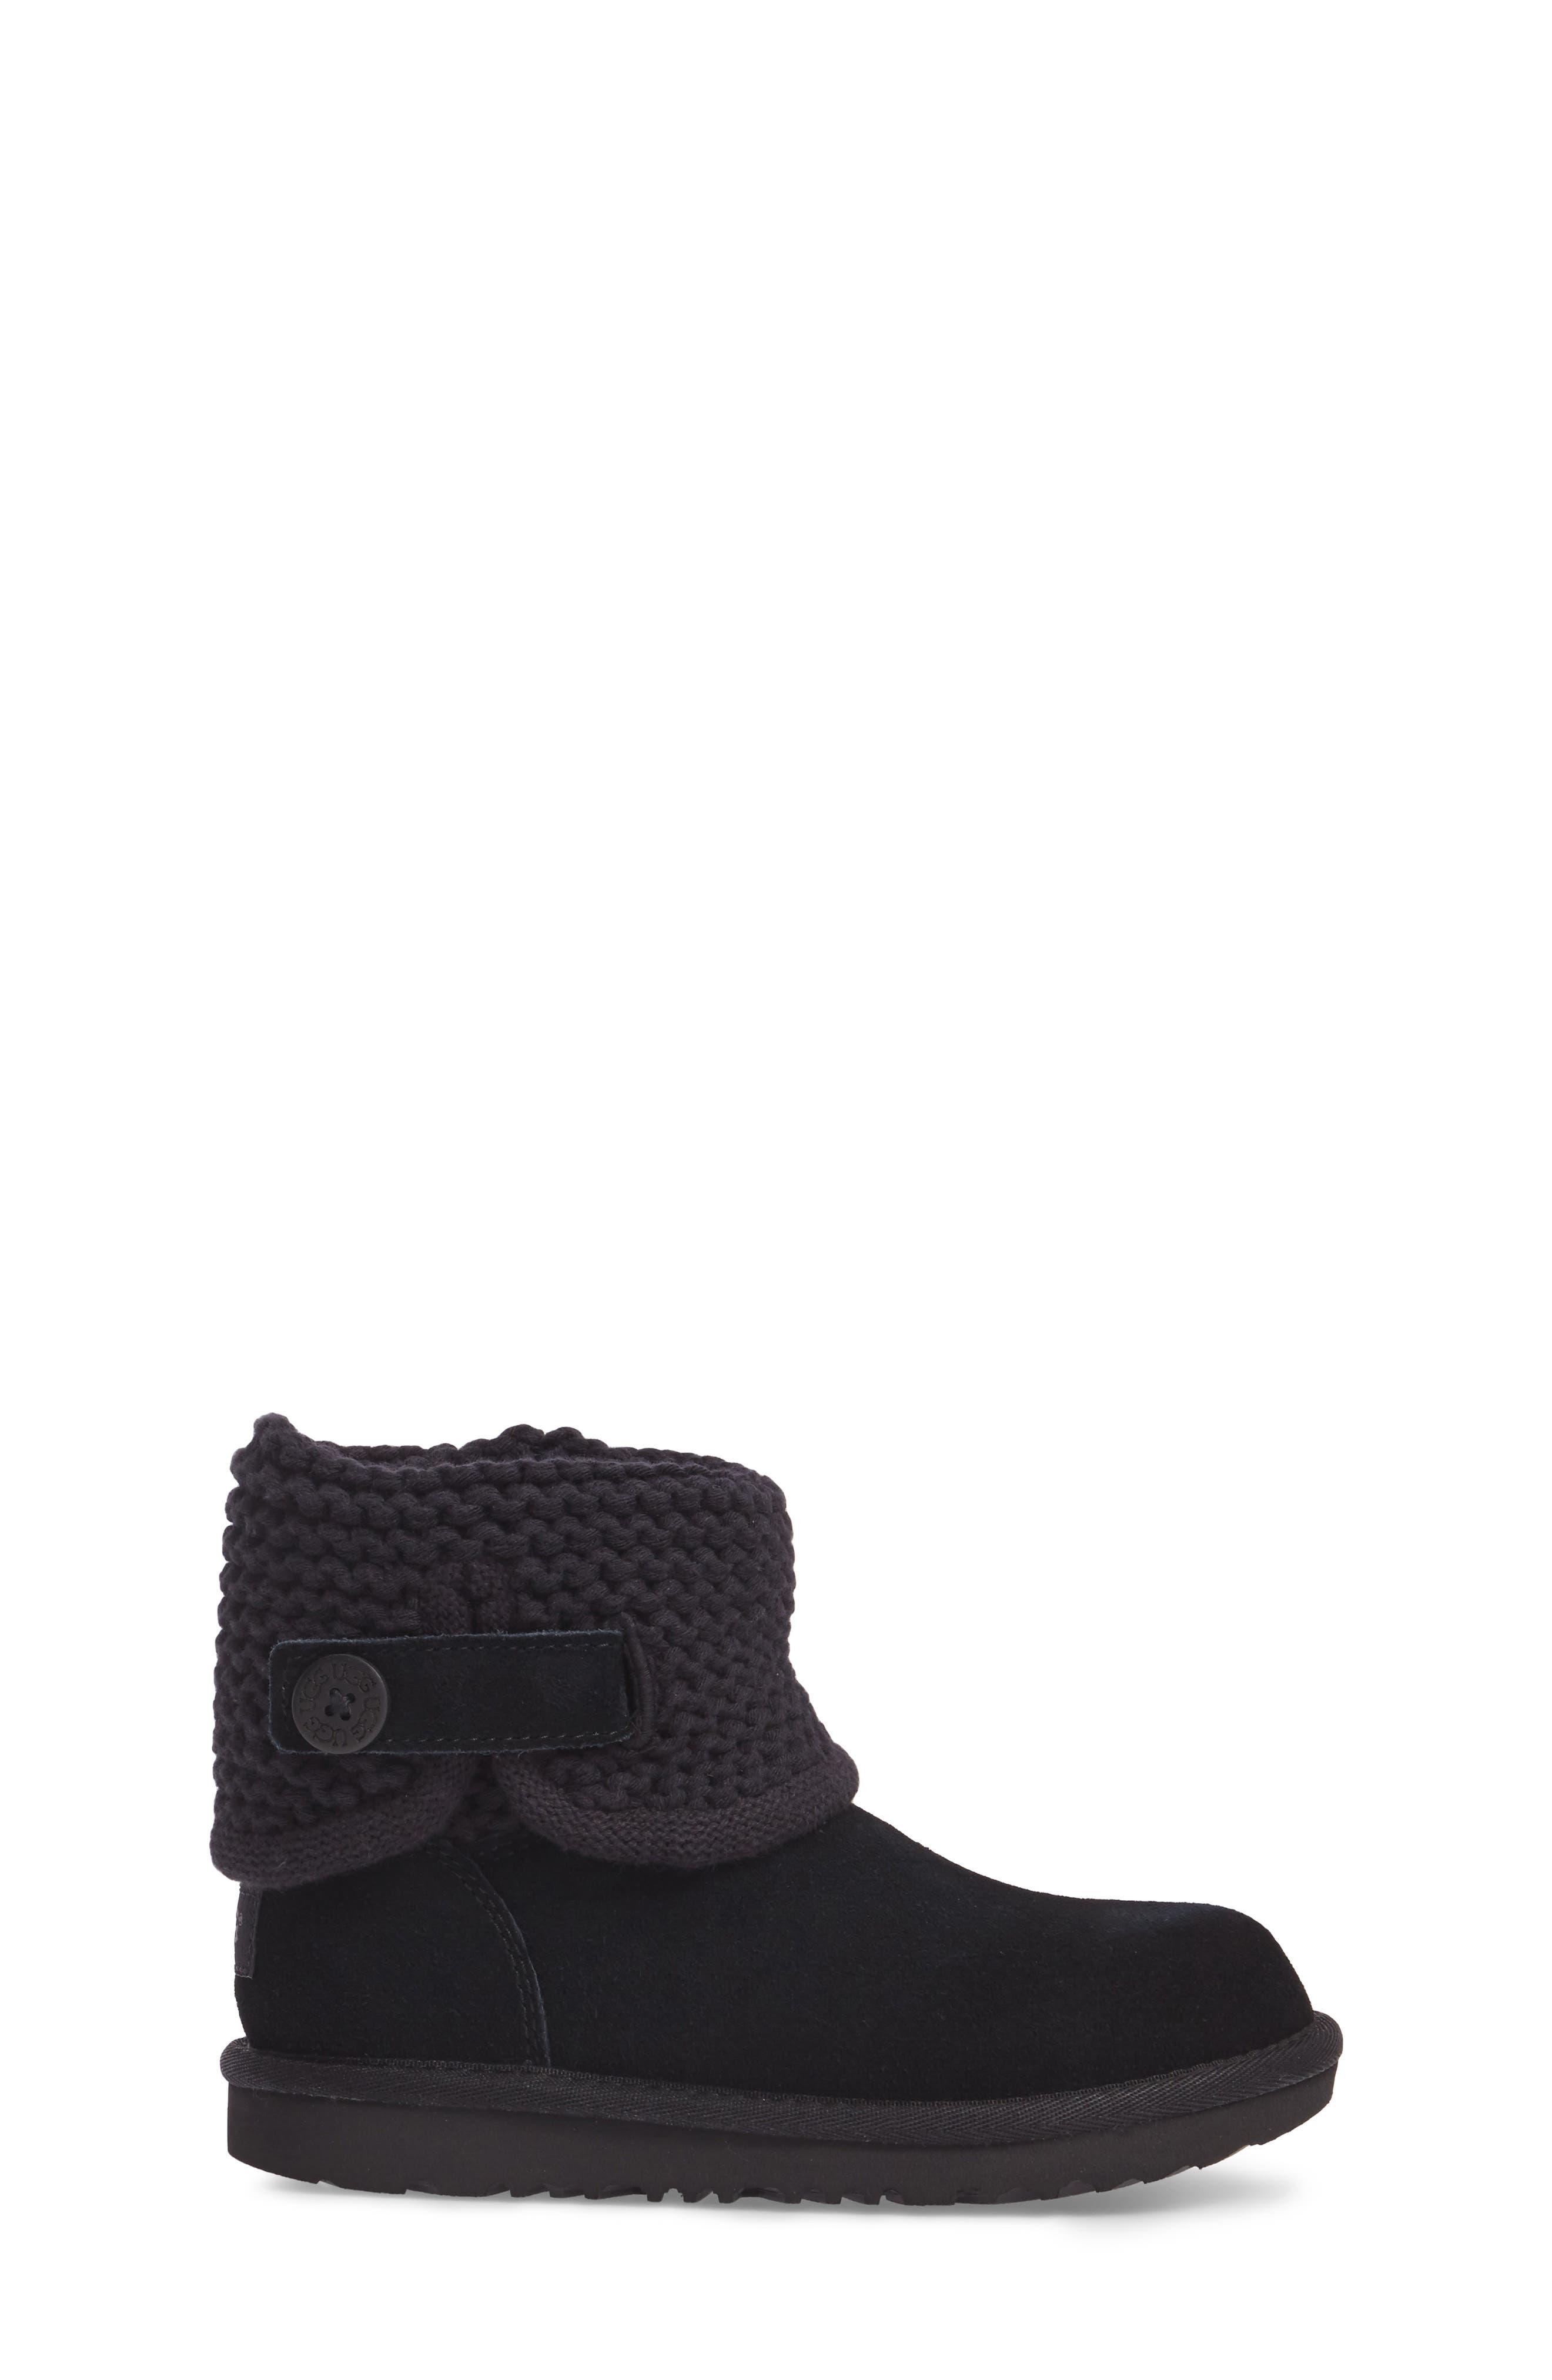 Darrah II Knit Cuff Boot,                             Alternate thumbnail 3, color,                             001